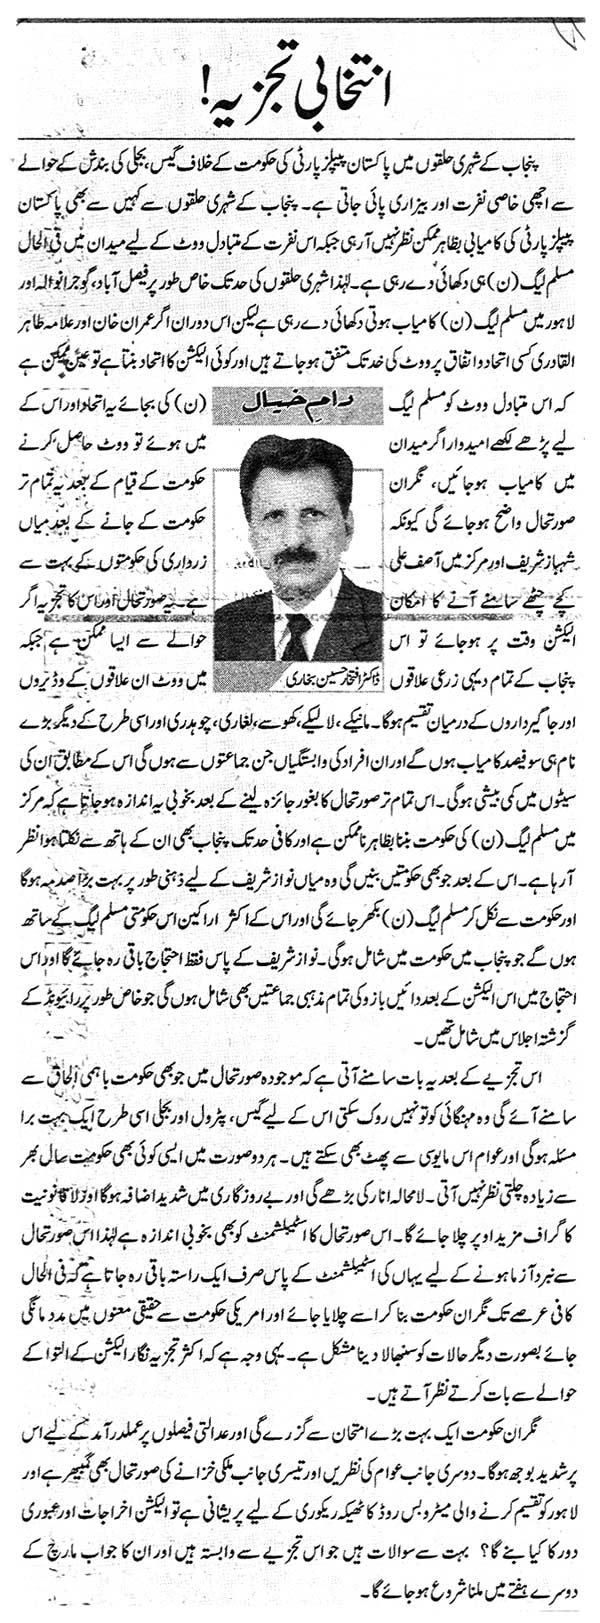 Print Media Coverage Daily Waqt